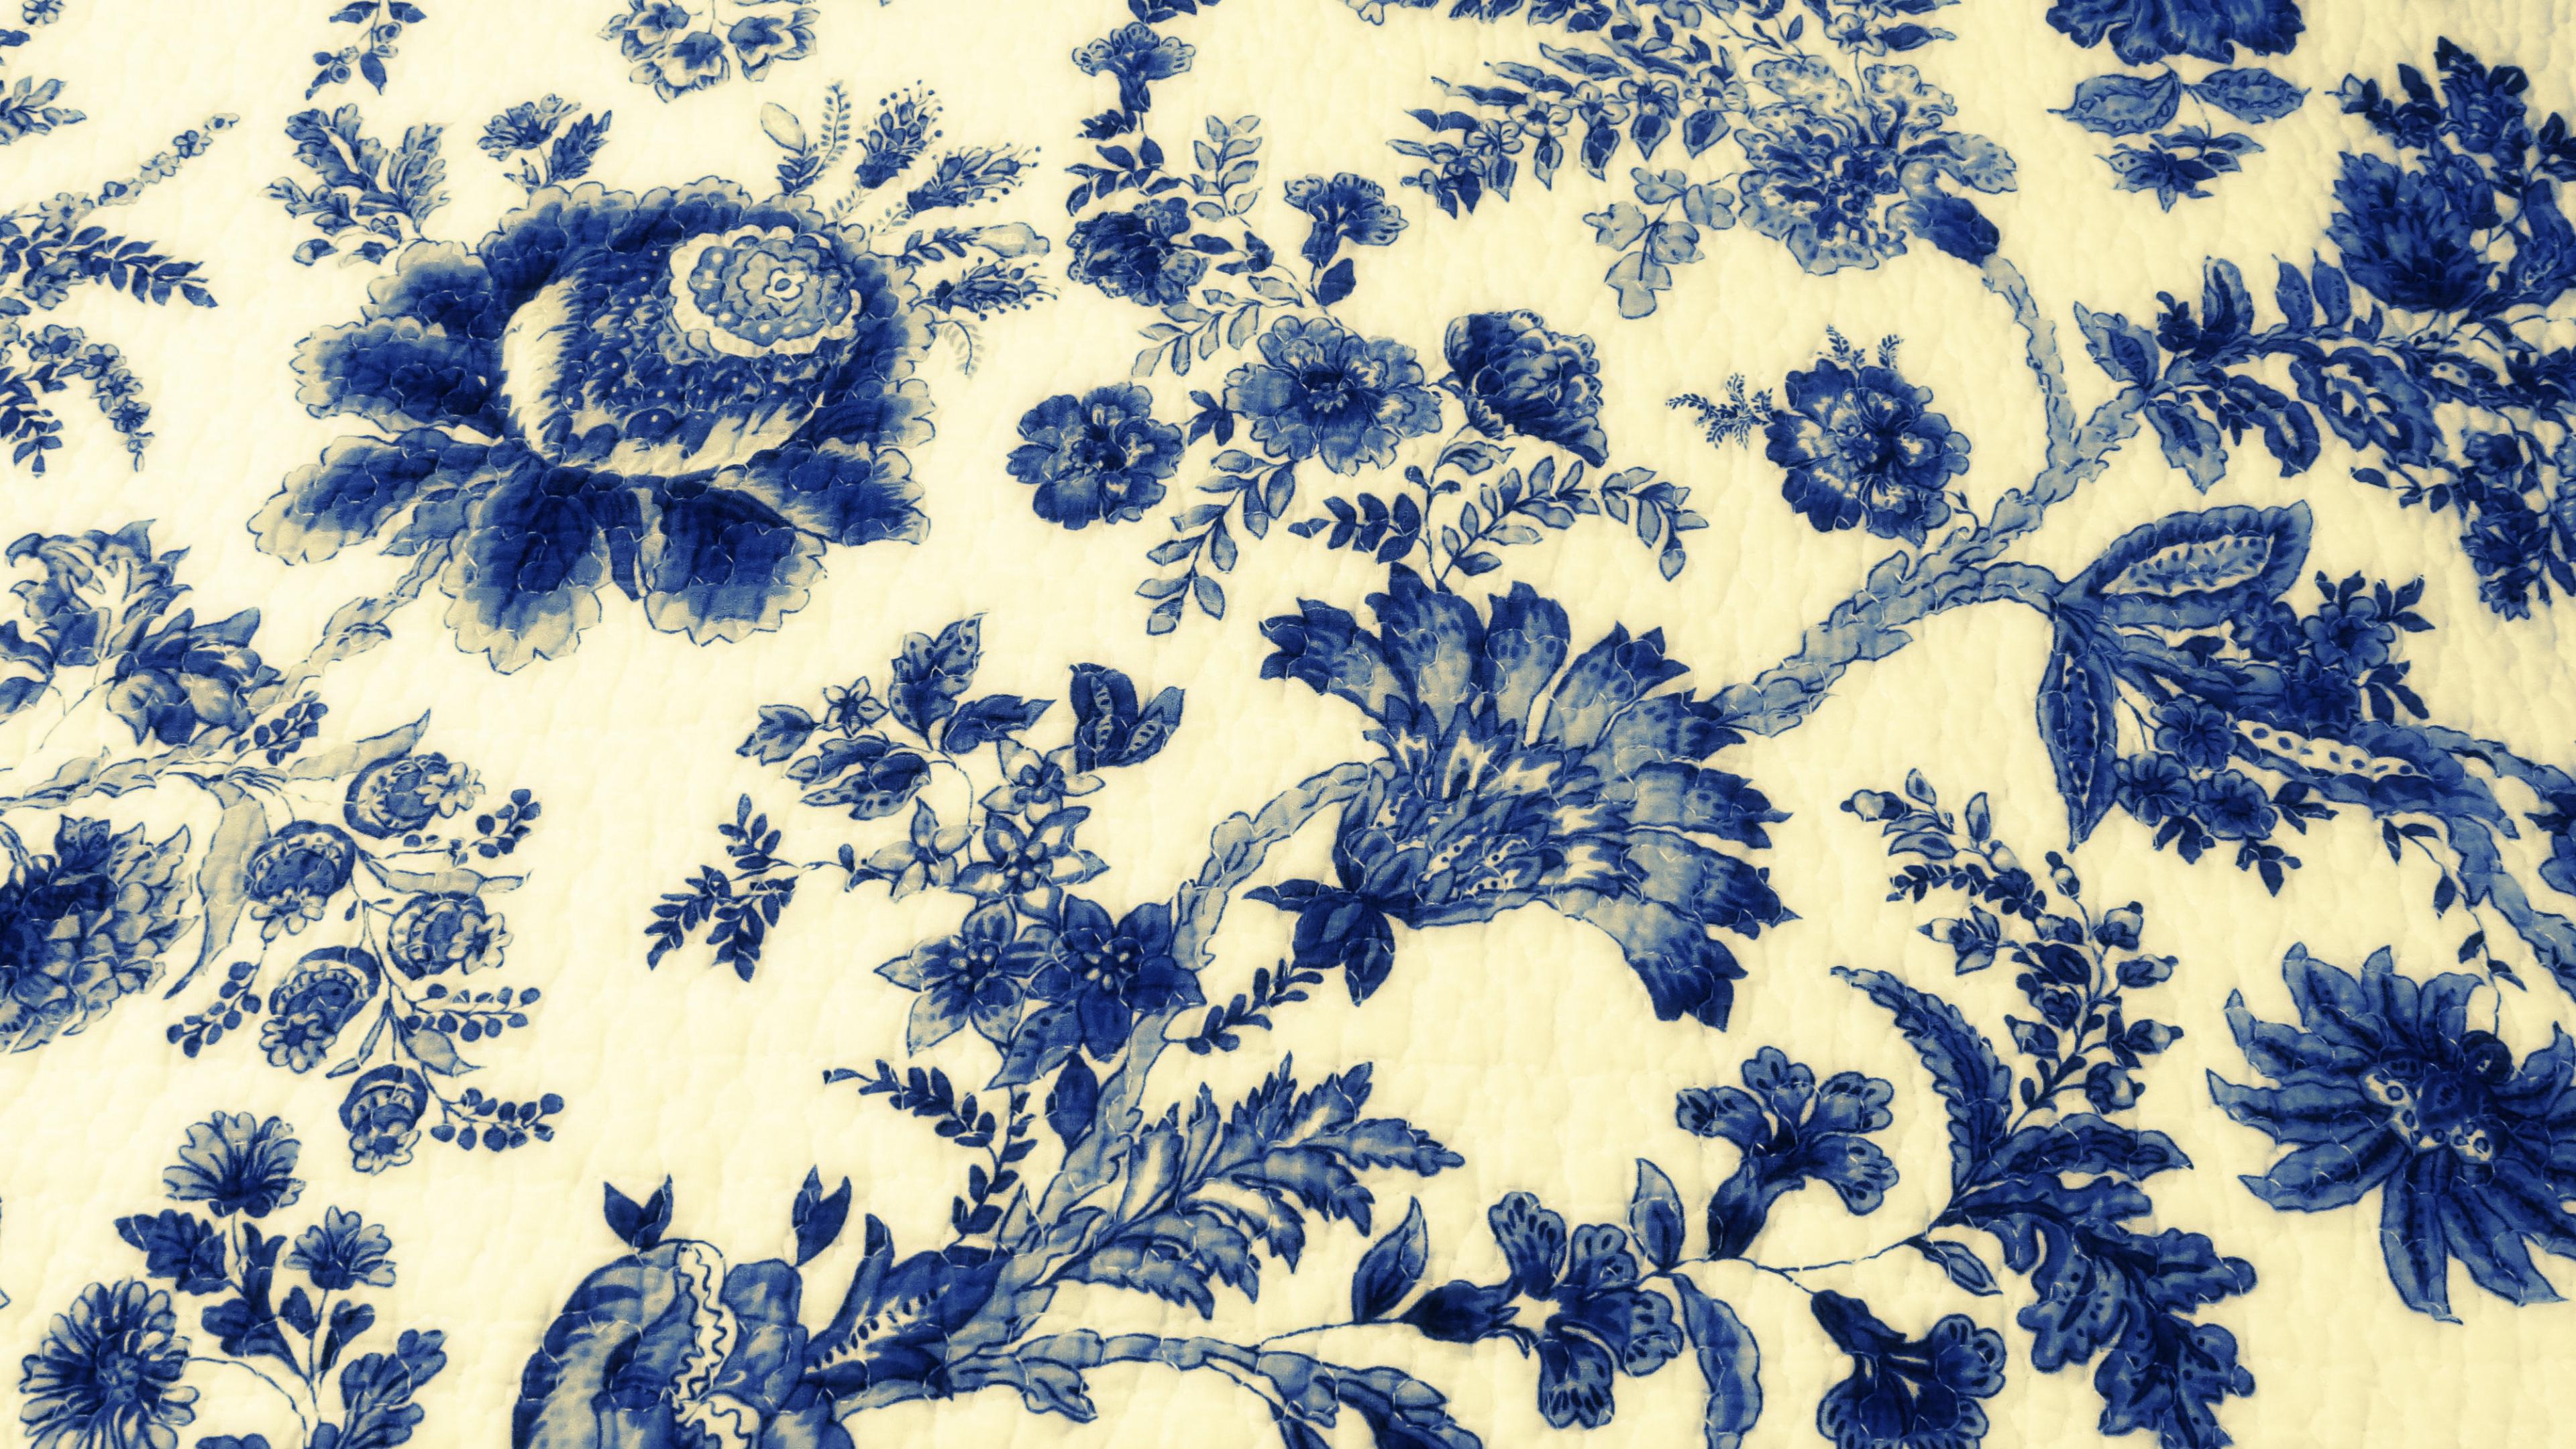 Download Wallpaper 3840x2160 Texture Wallpaper Patterns 4K Ultra HD 3840x2160